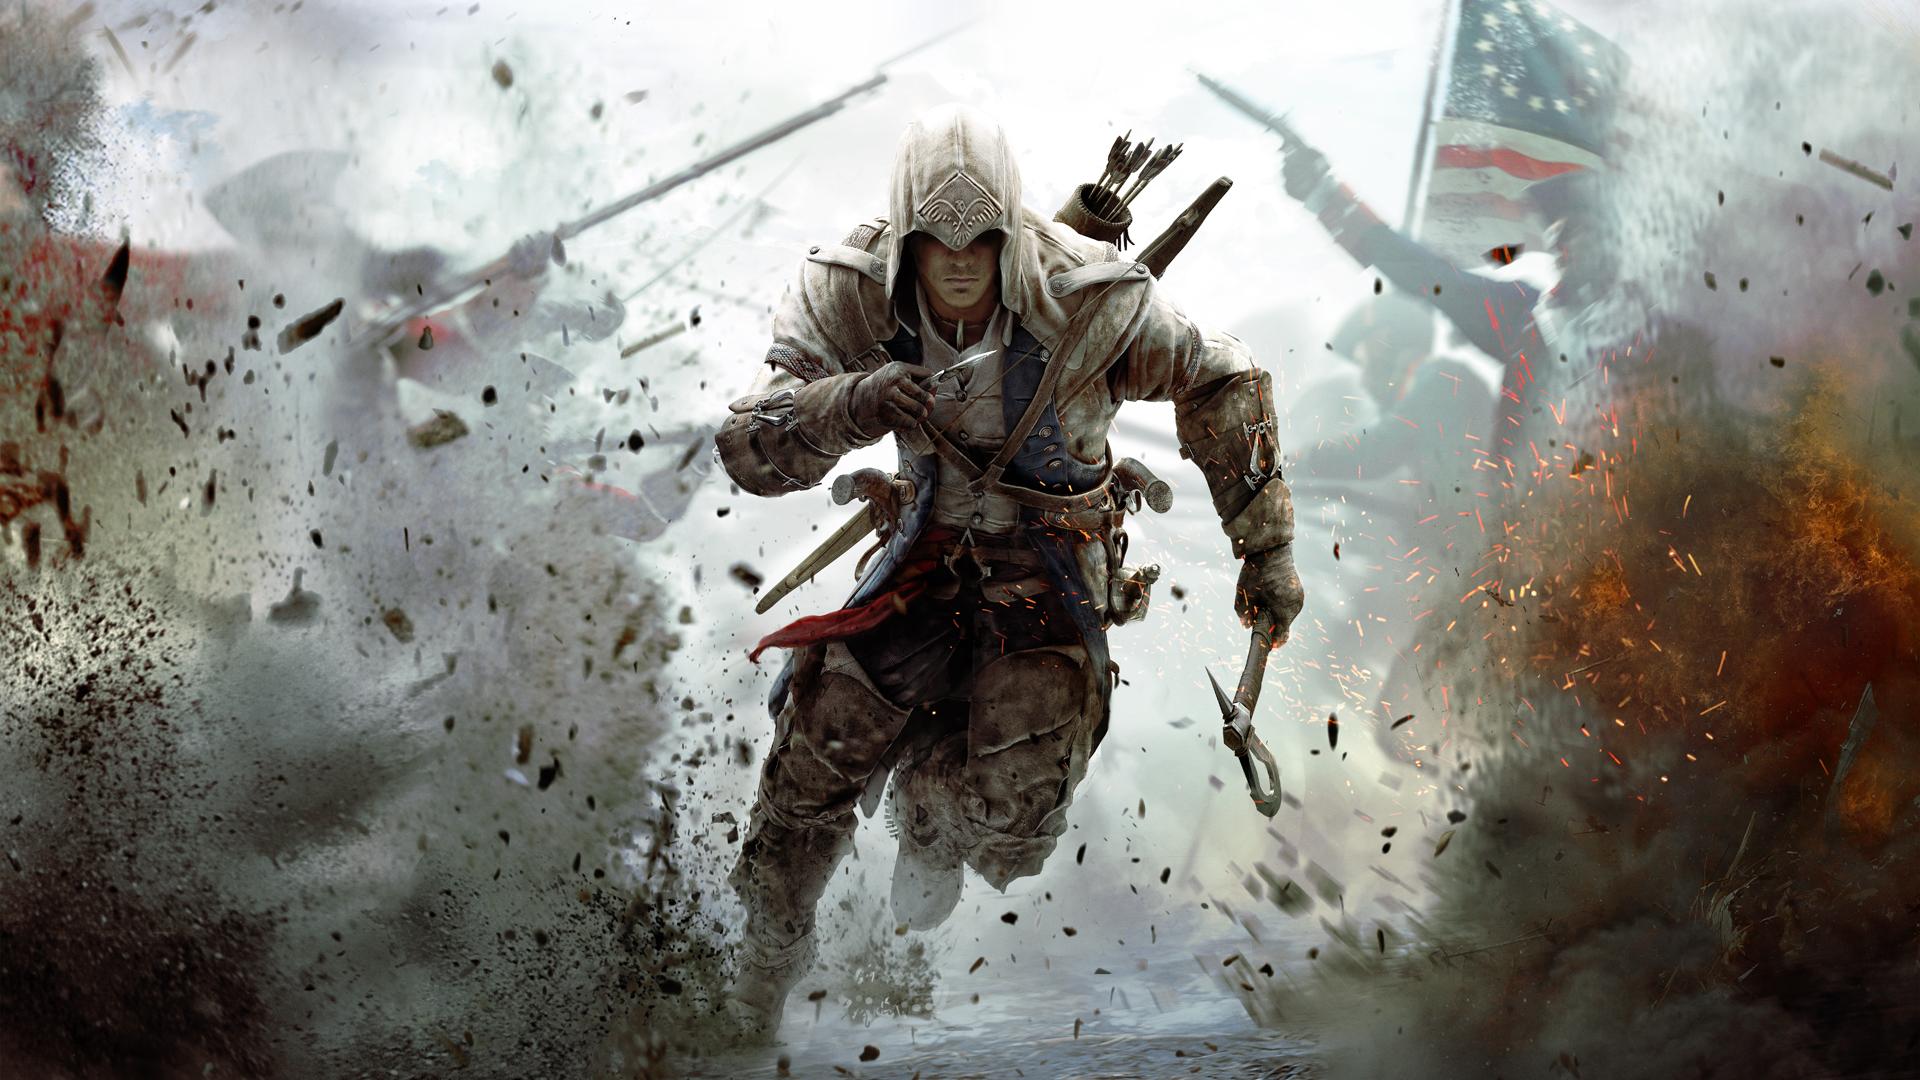 Обои из Uplay - Assassin's Creed 3